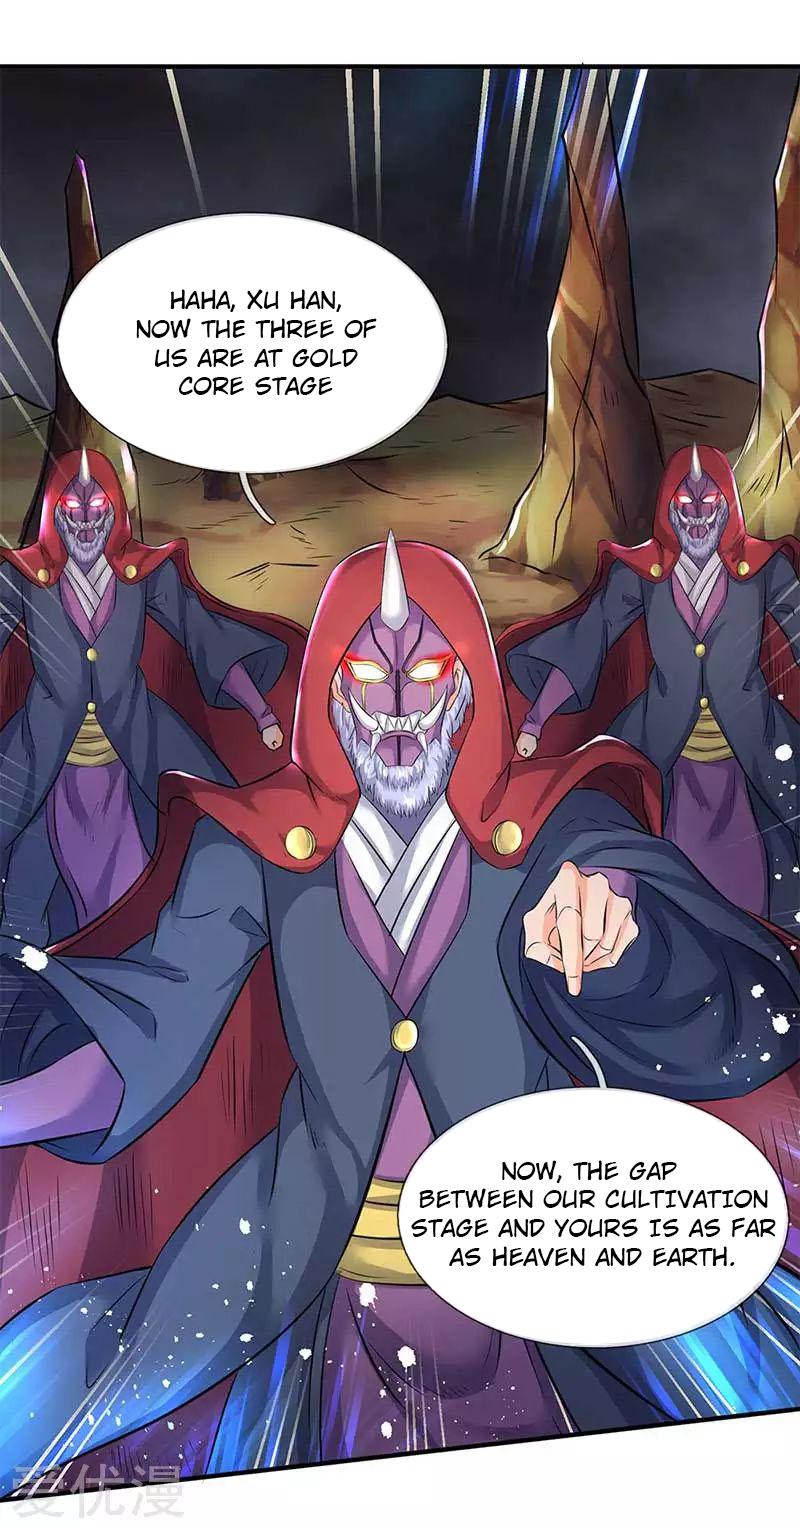 https://manga.mangadogs.com/comics/pic4/39/32615/1618228/717d880623a6998b67c25c216ae2c1de.jpg Page 1